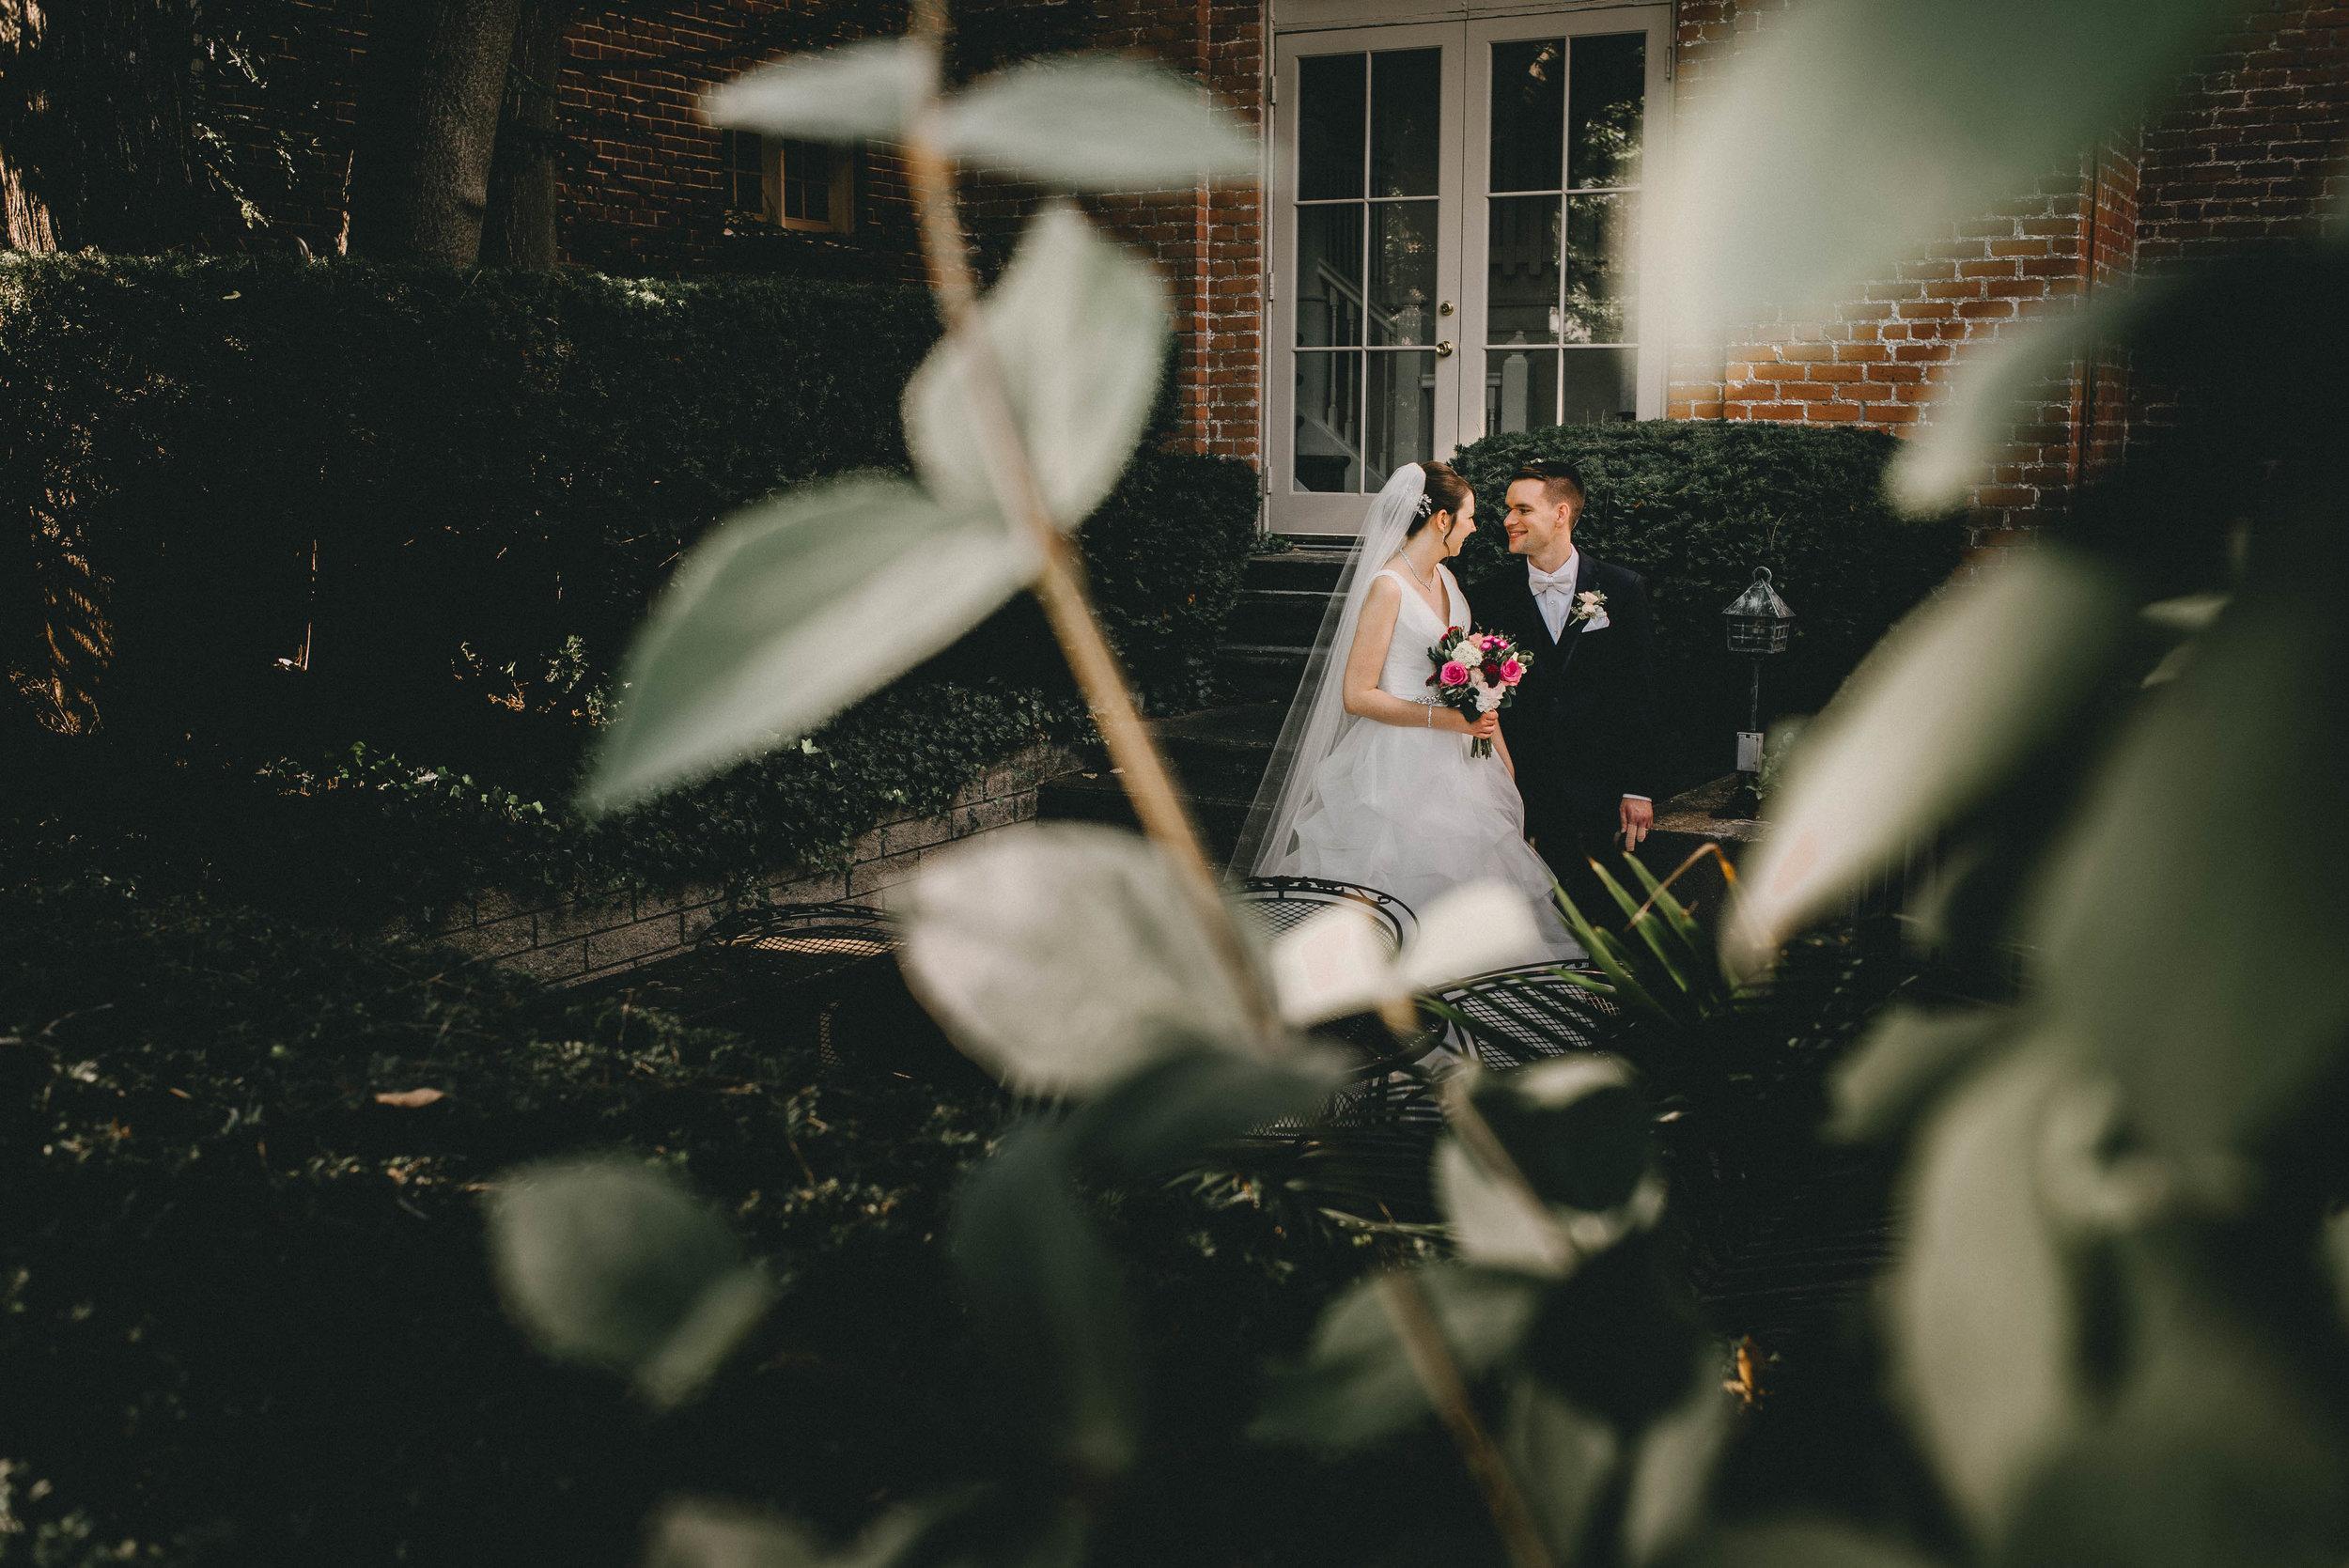 Kara and Mike Wedding-20160904-17-19-29.jpg